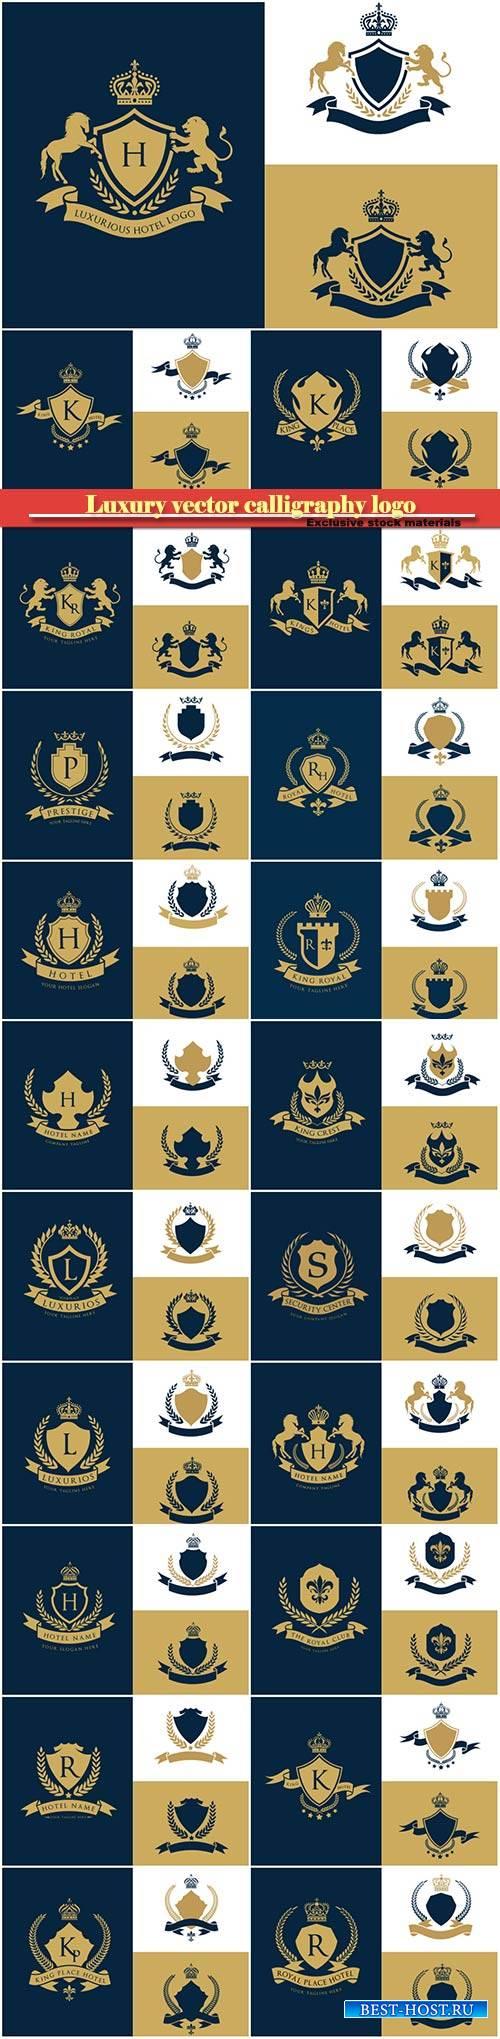 Luxury vector calligraphy logo, heraldry premium insignia design crown